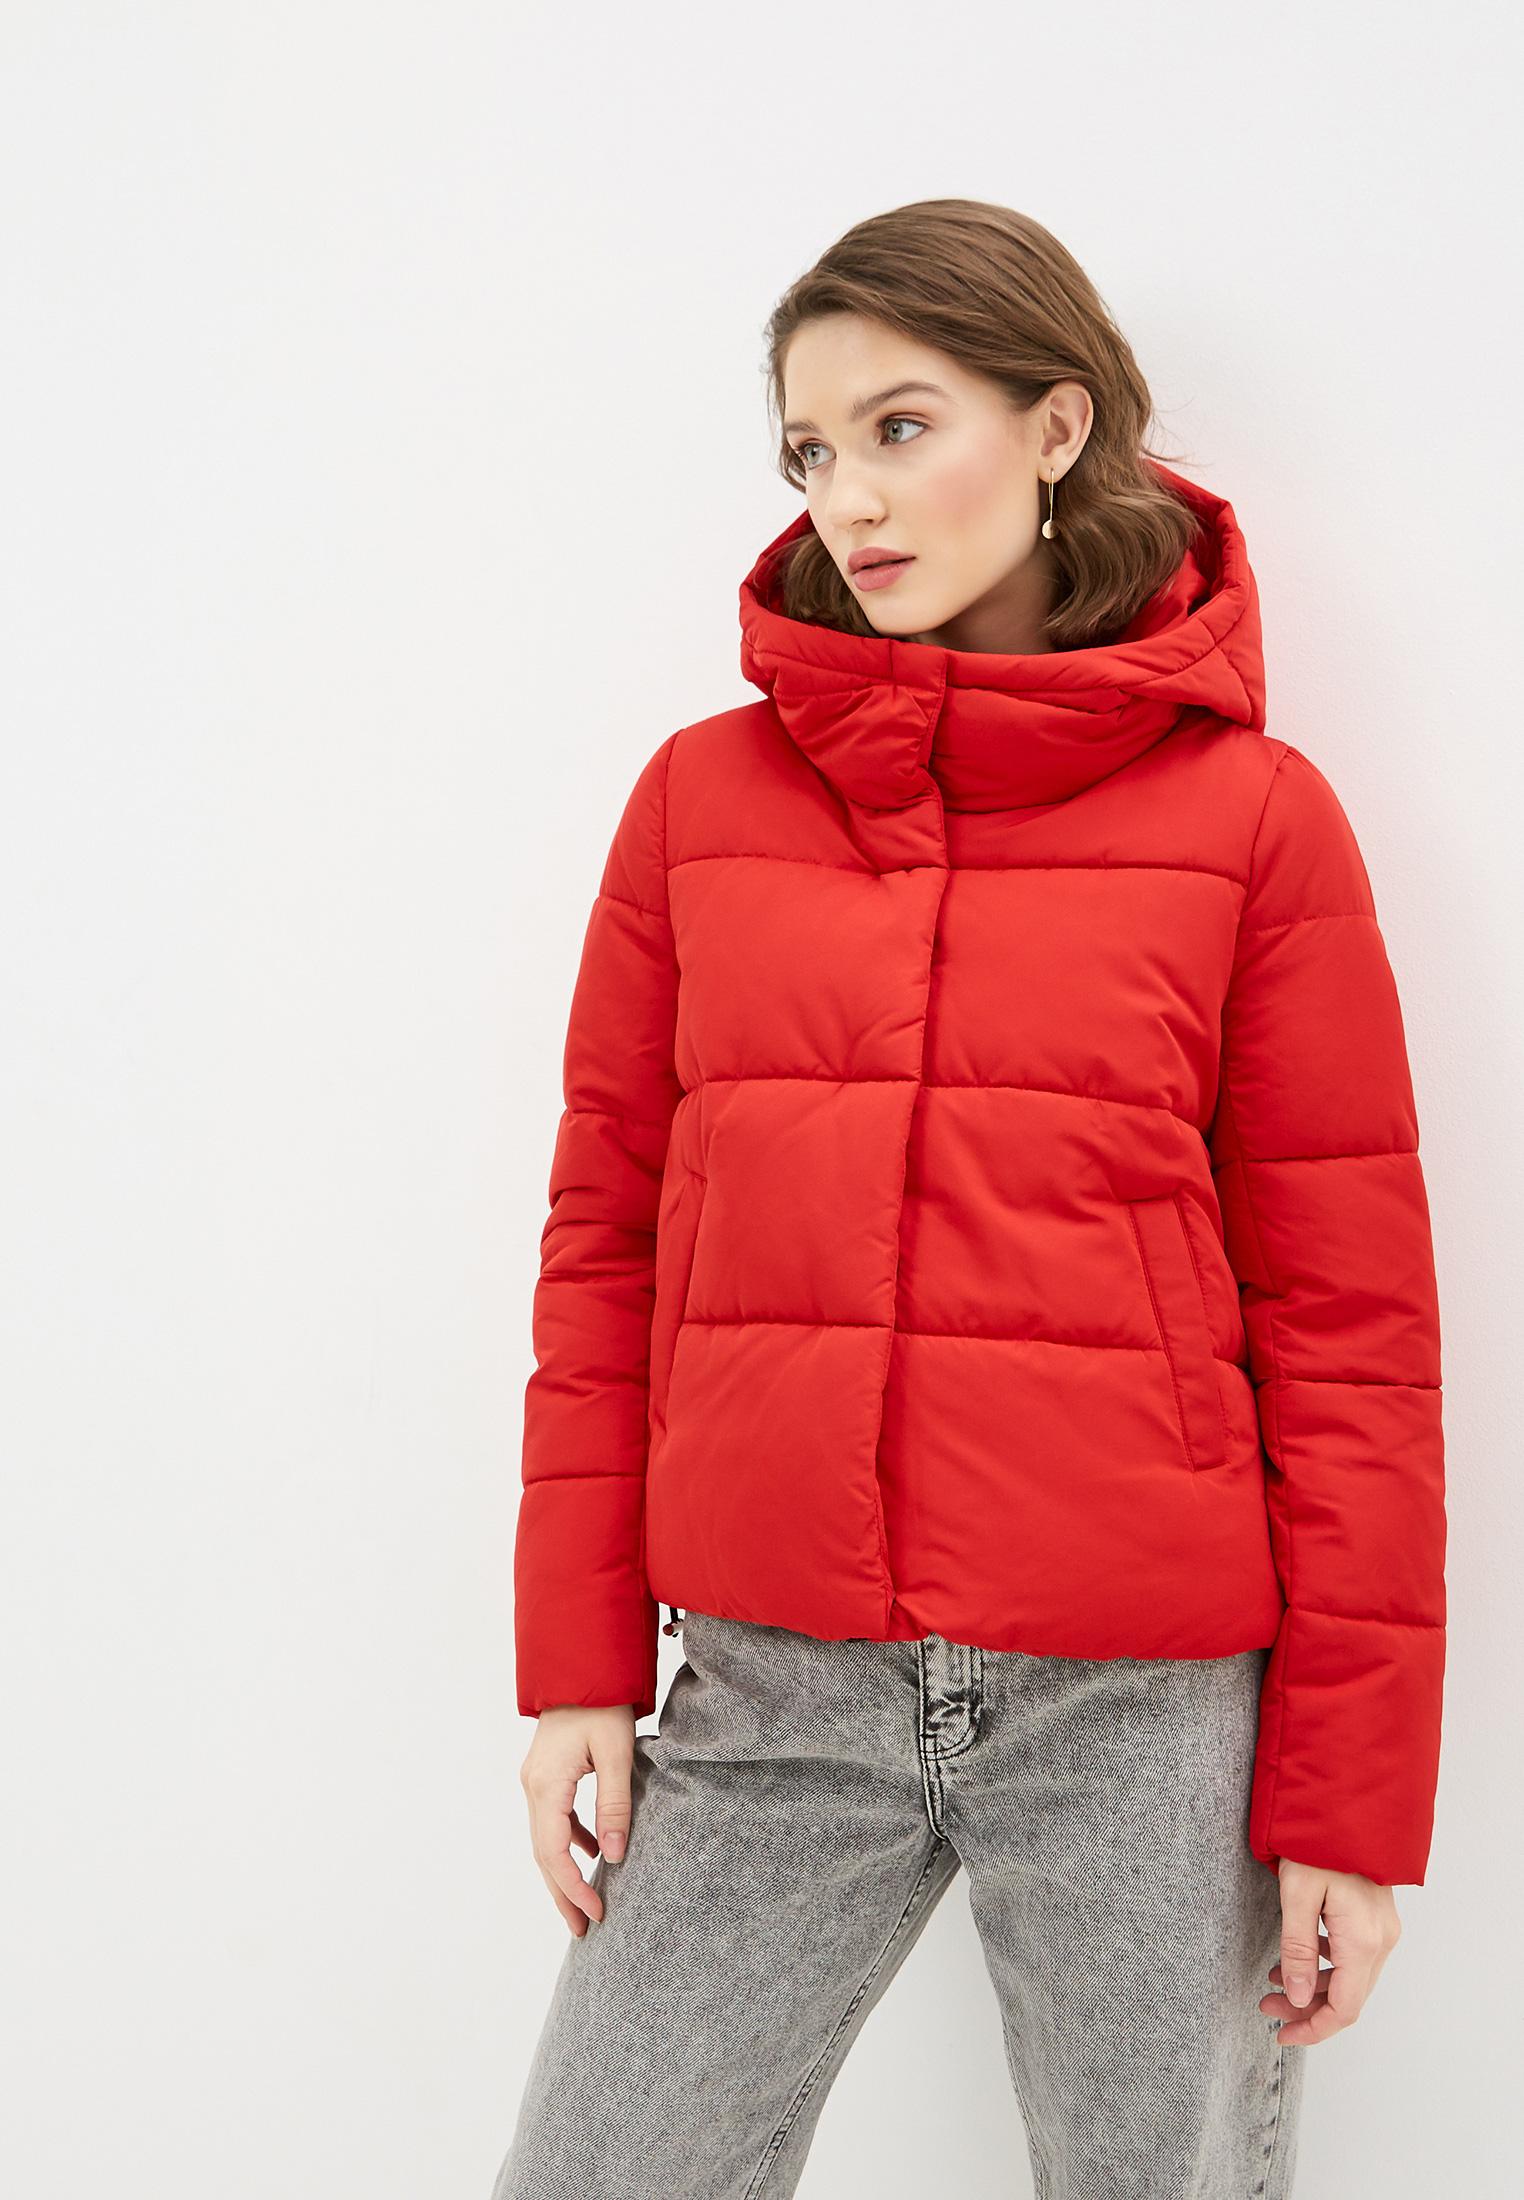 Куртка утепленная, Pimkie, цвет: красный. Артикул: PI033EWGLDK6. Одежда / Верхняя одежда